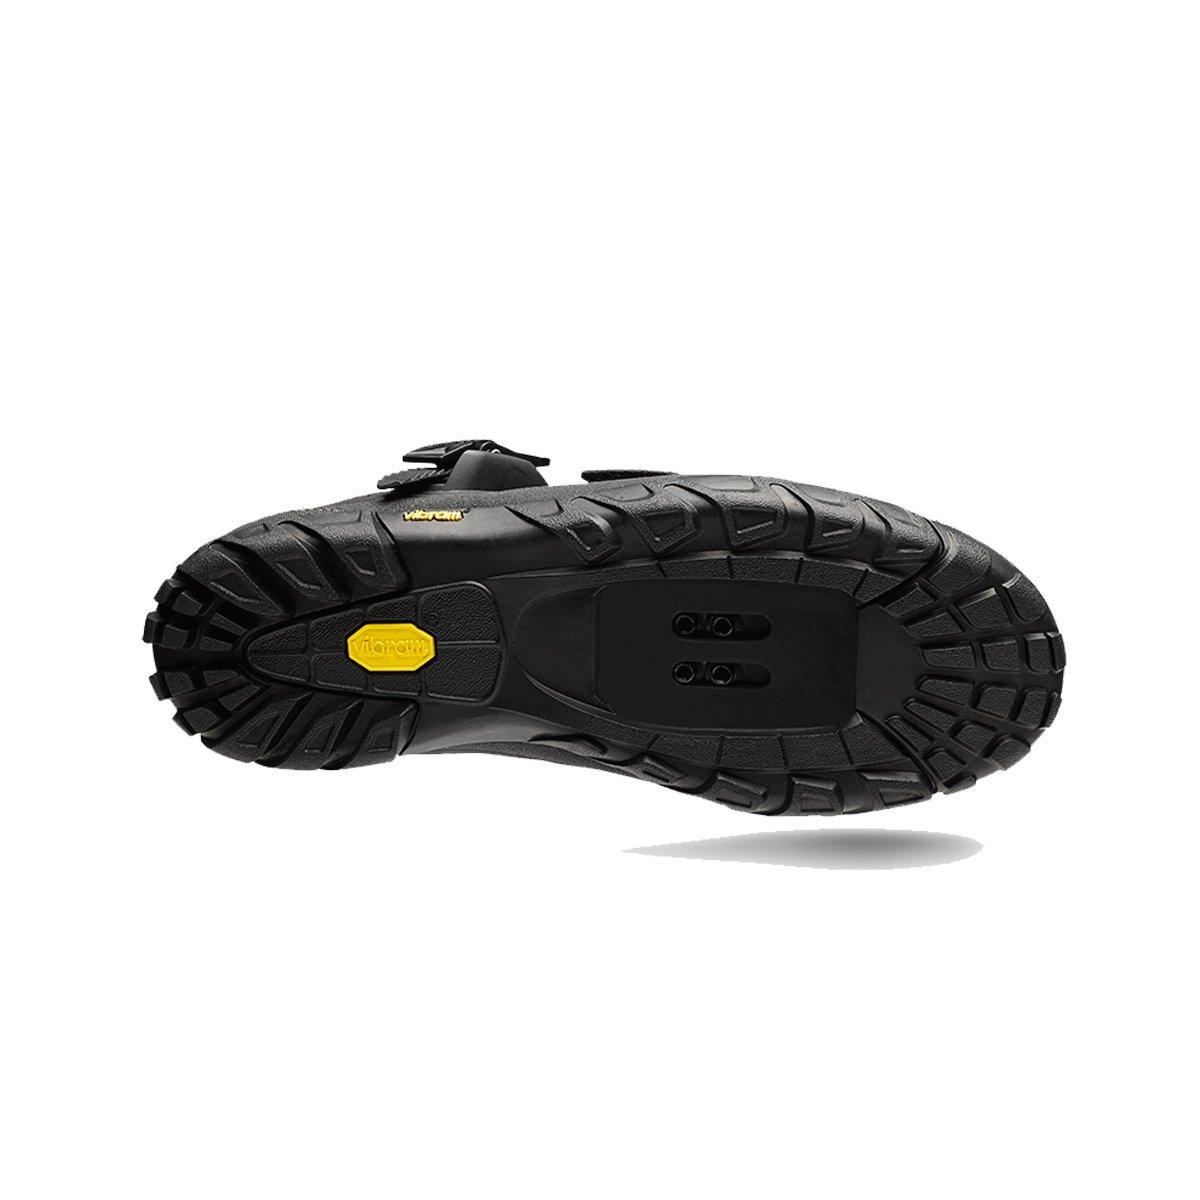 Giro Terraduro Hv MTB, Zapatos de Bicicleta de montaña para Hombre: Amazon.es: Zapatos y complementos